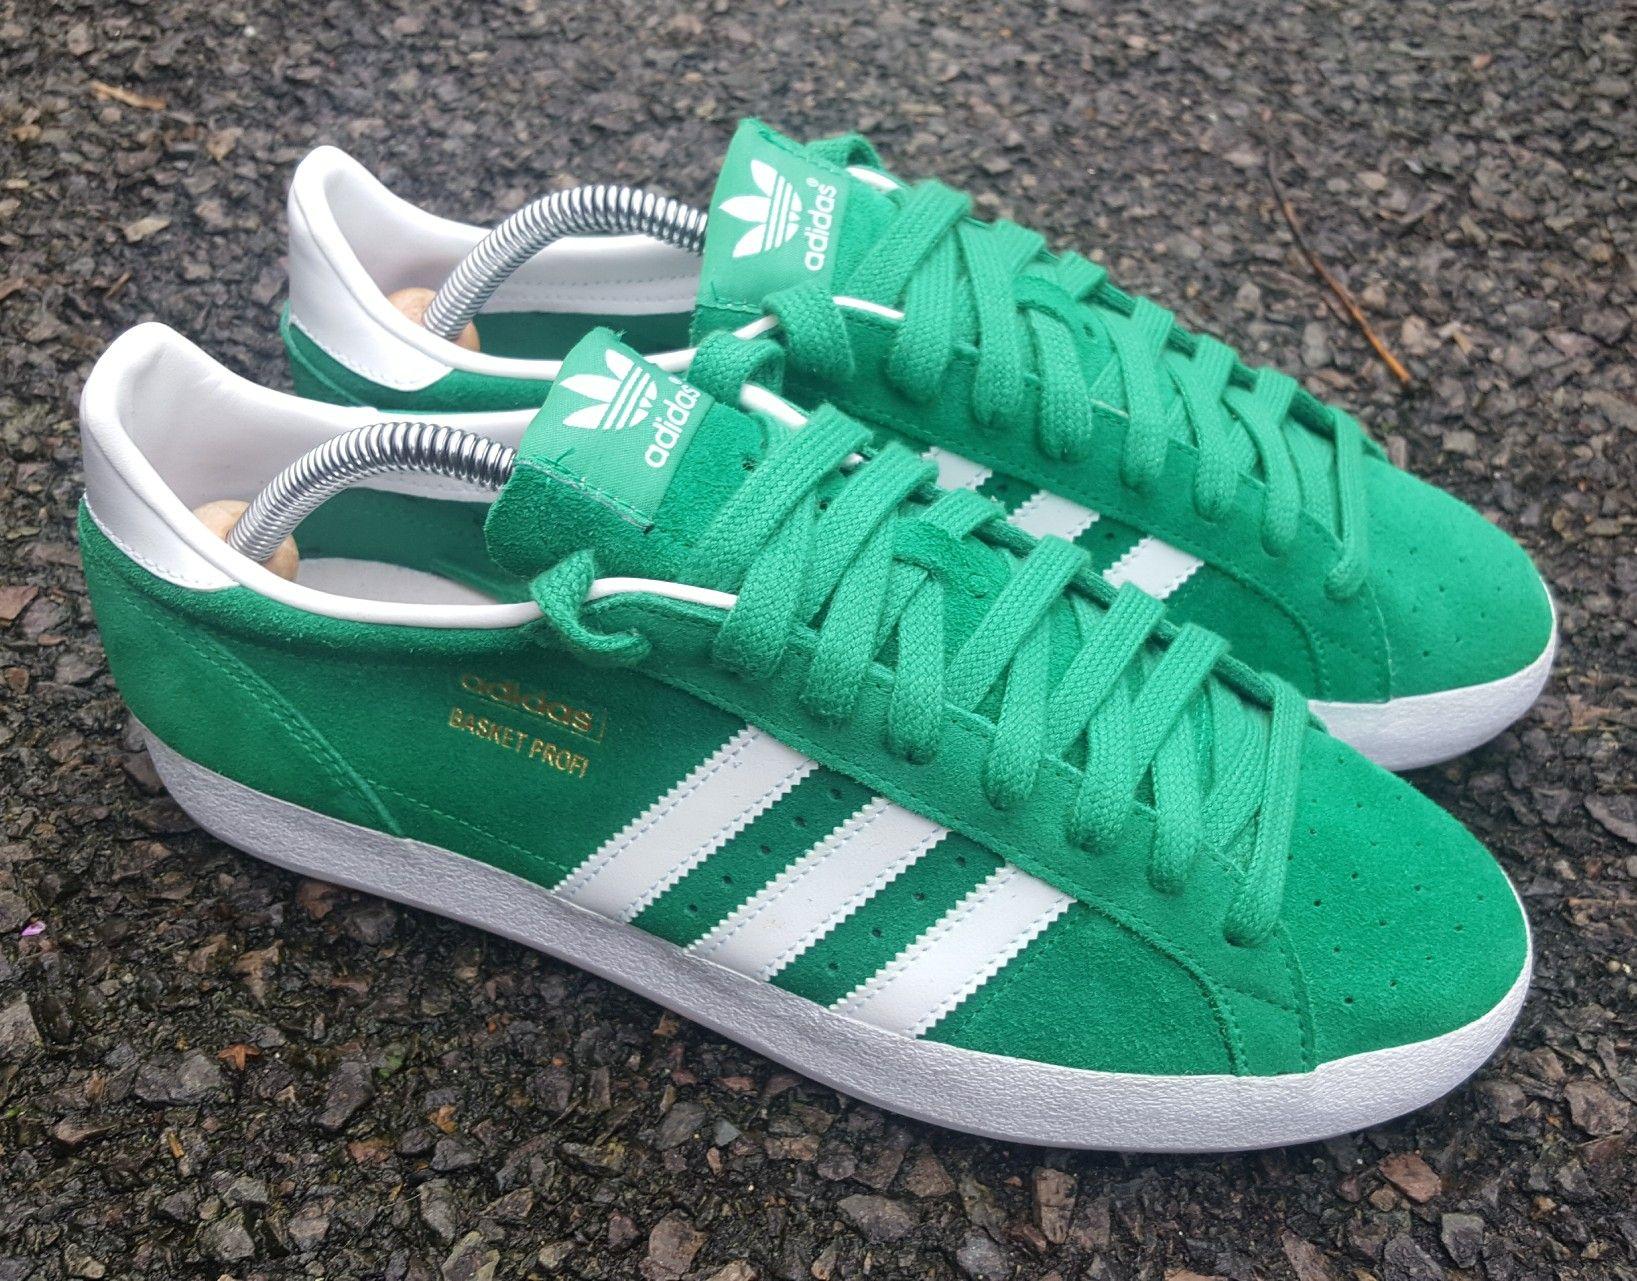 super populaire d1ee7 597e7 Rather nice Adidas Originals Basket Profi i picked up for a ...